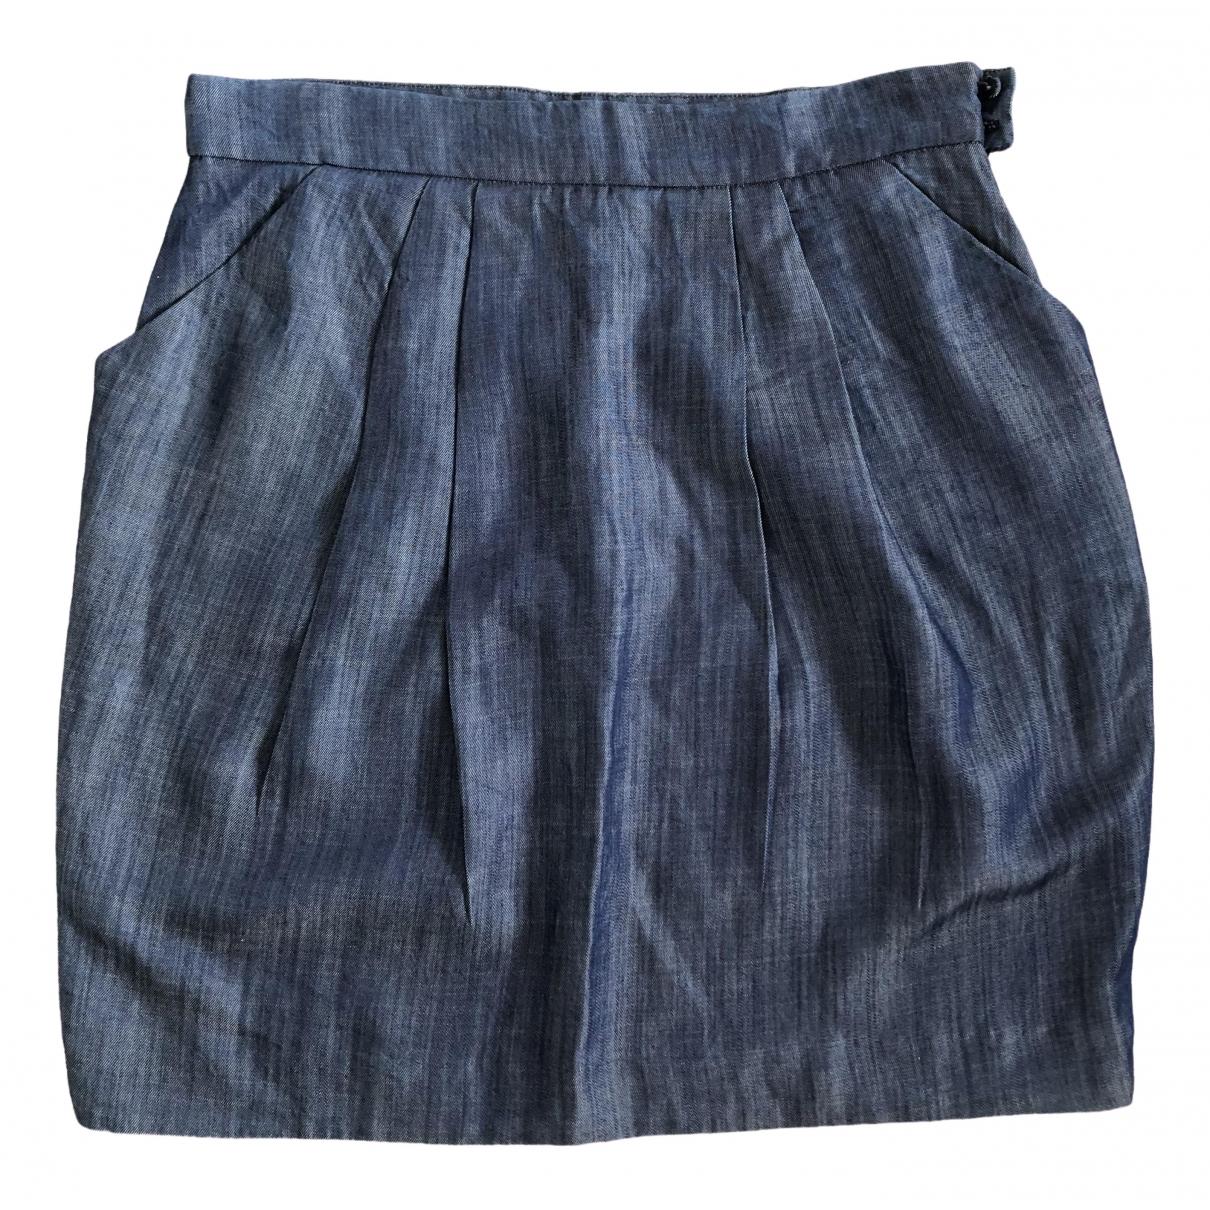 Claudie Pierlot \N Blue Cotton skirt for Women 40 FR